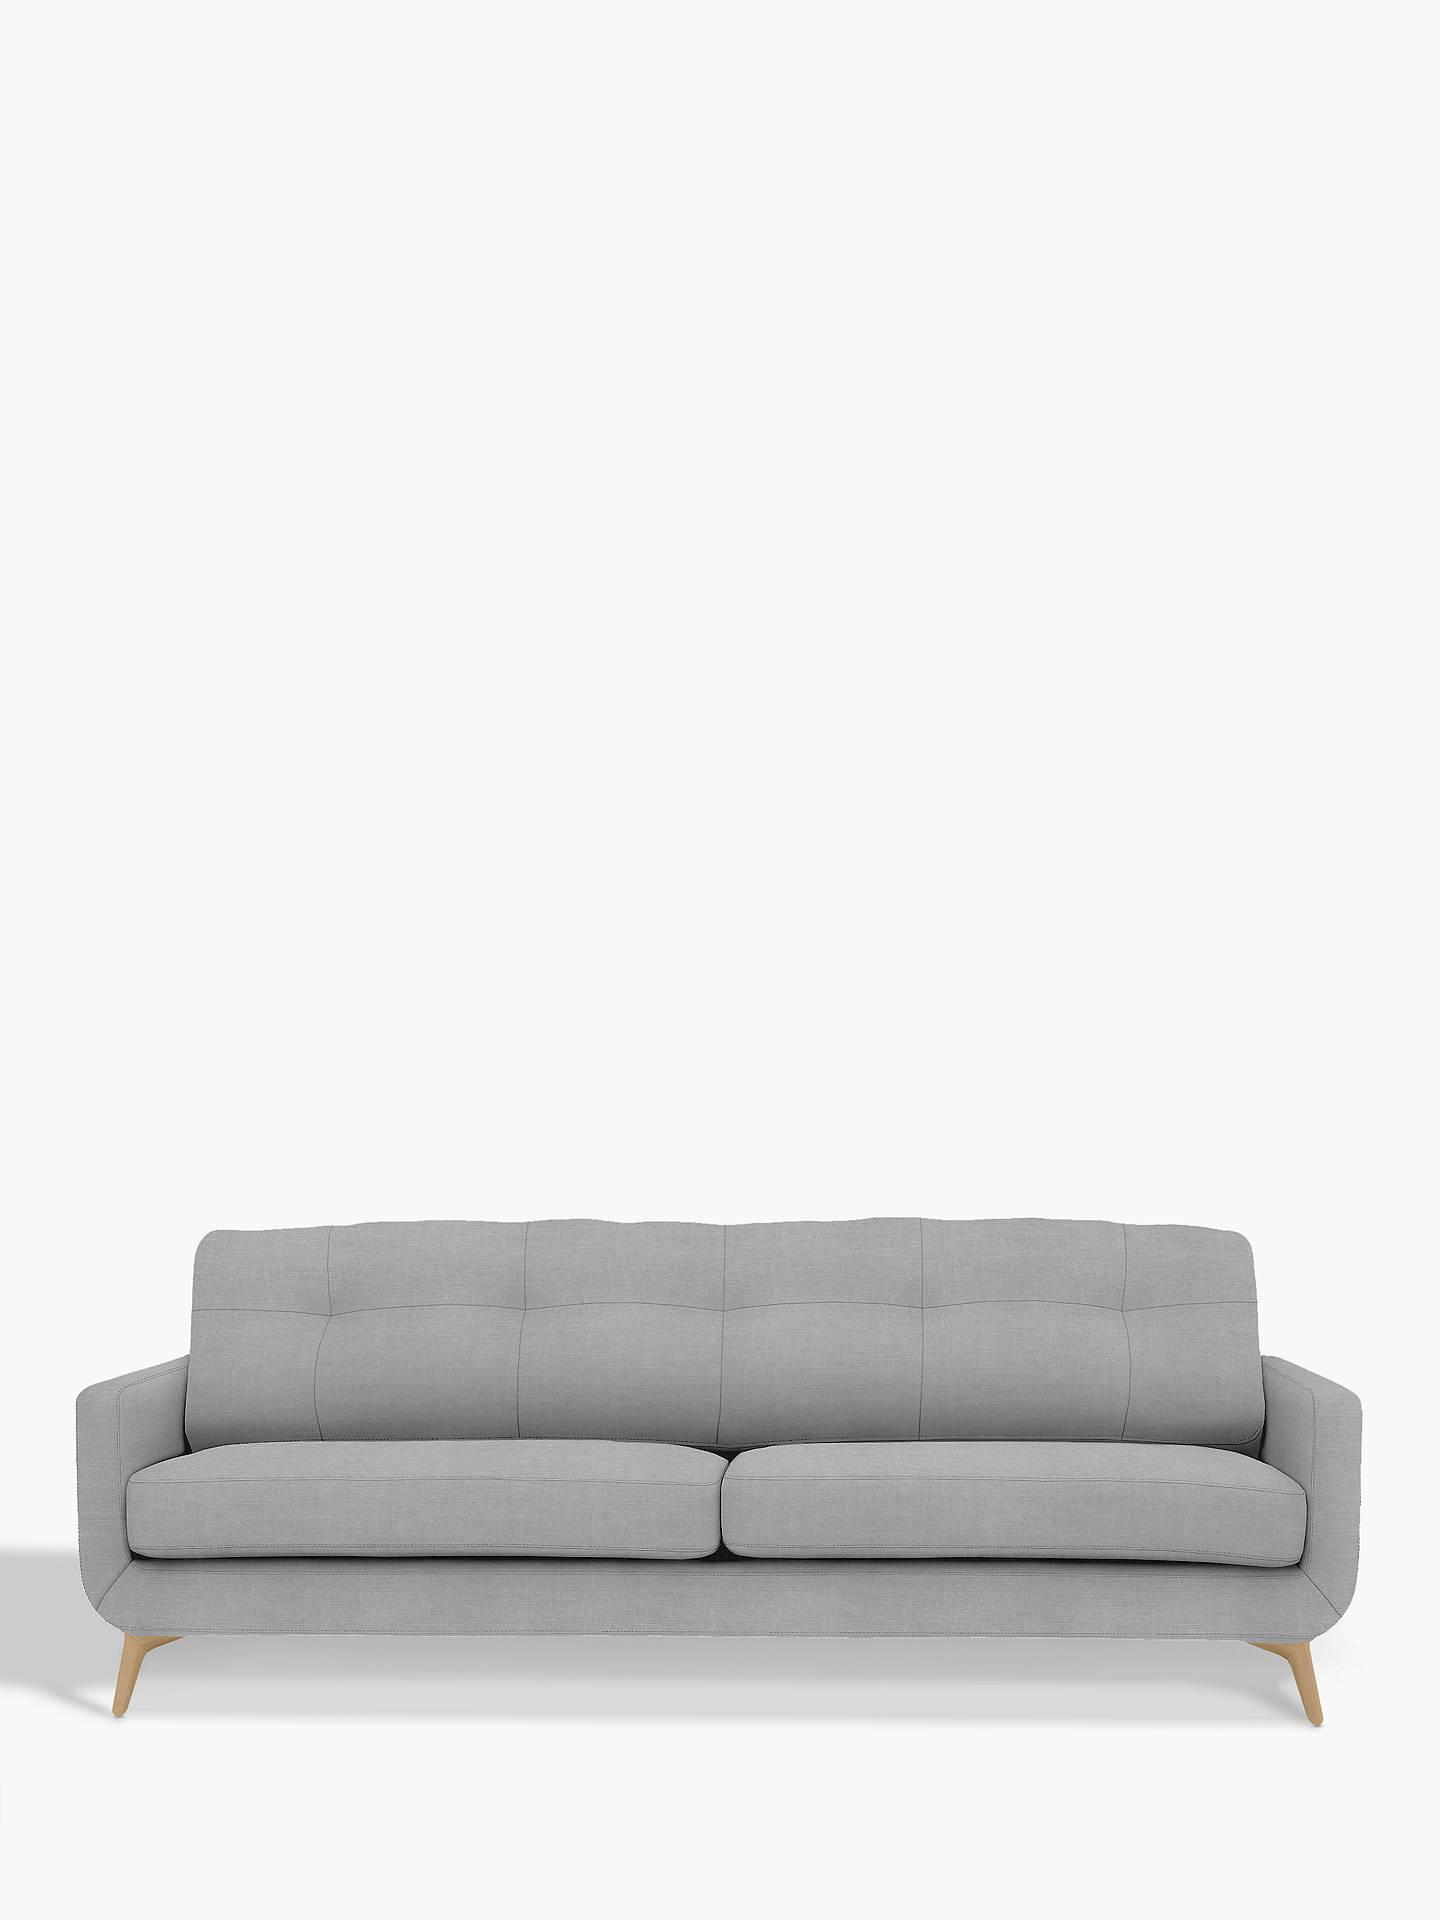 Superb John Lewis Partners Barbican Grand 4 Seater Sofa Home Interior And Landscaping Eliaenasavecom